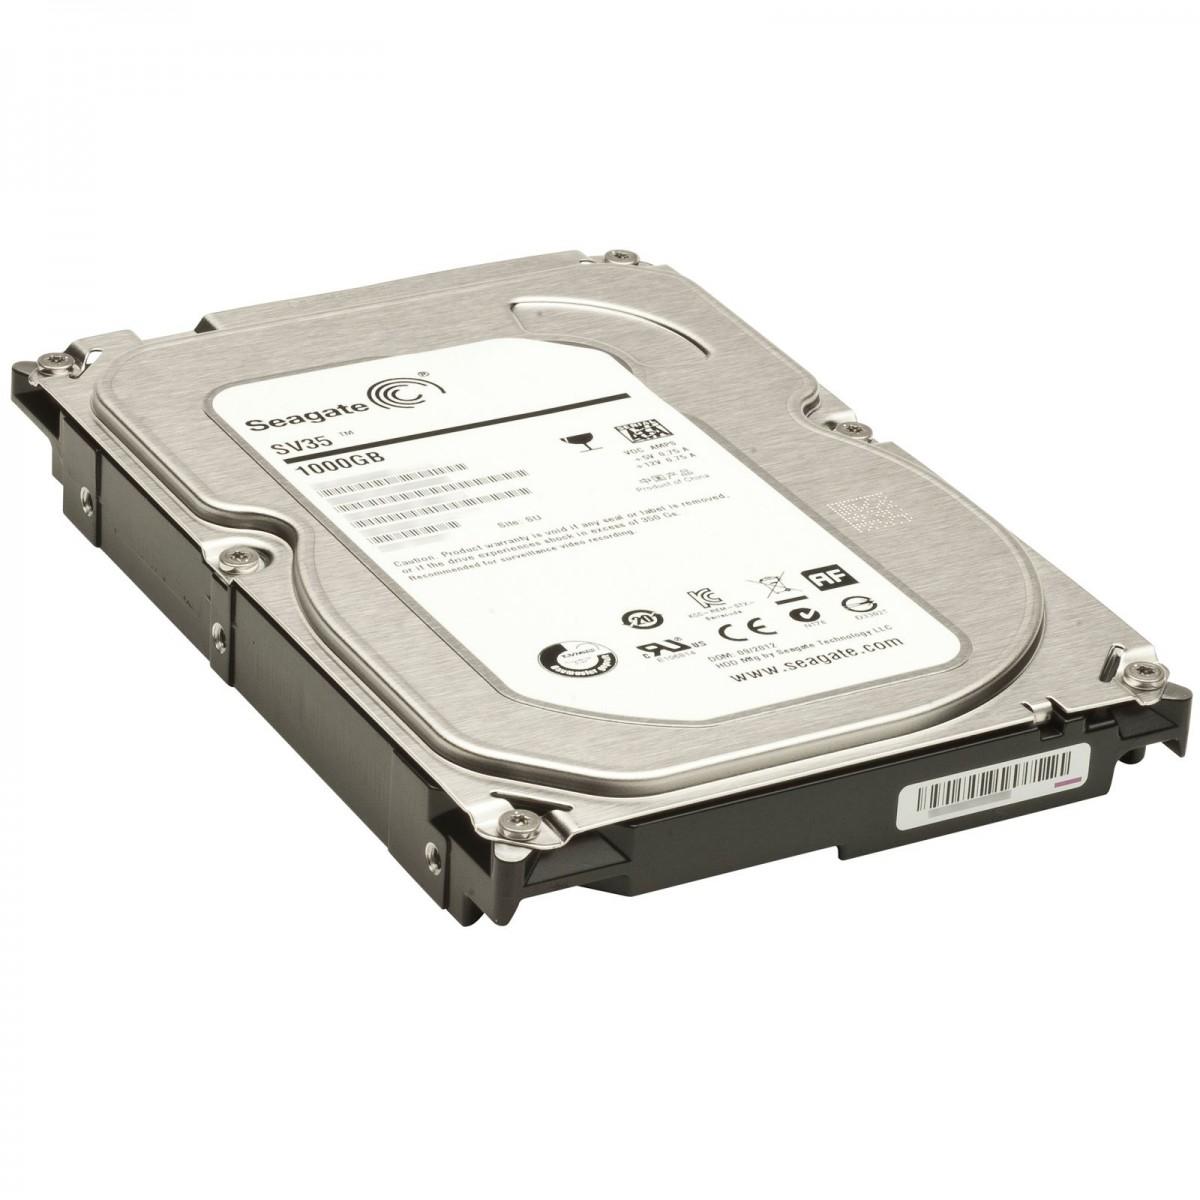 Hard Disk 1TB Sata III 64MB ST1000VX000 - Seagate